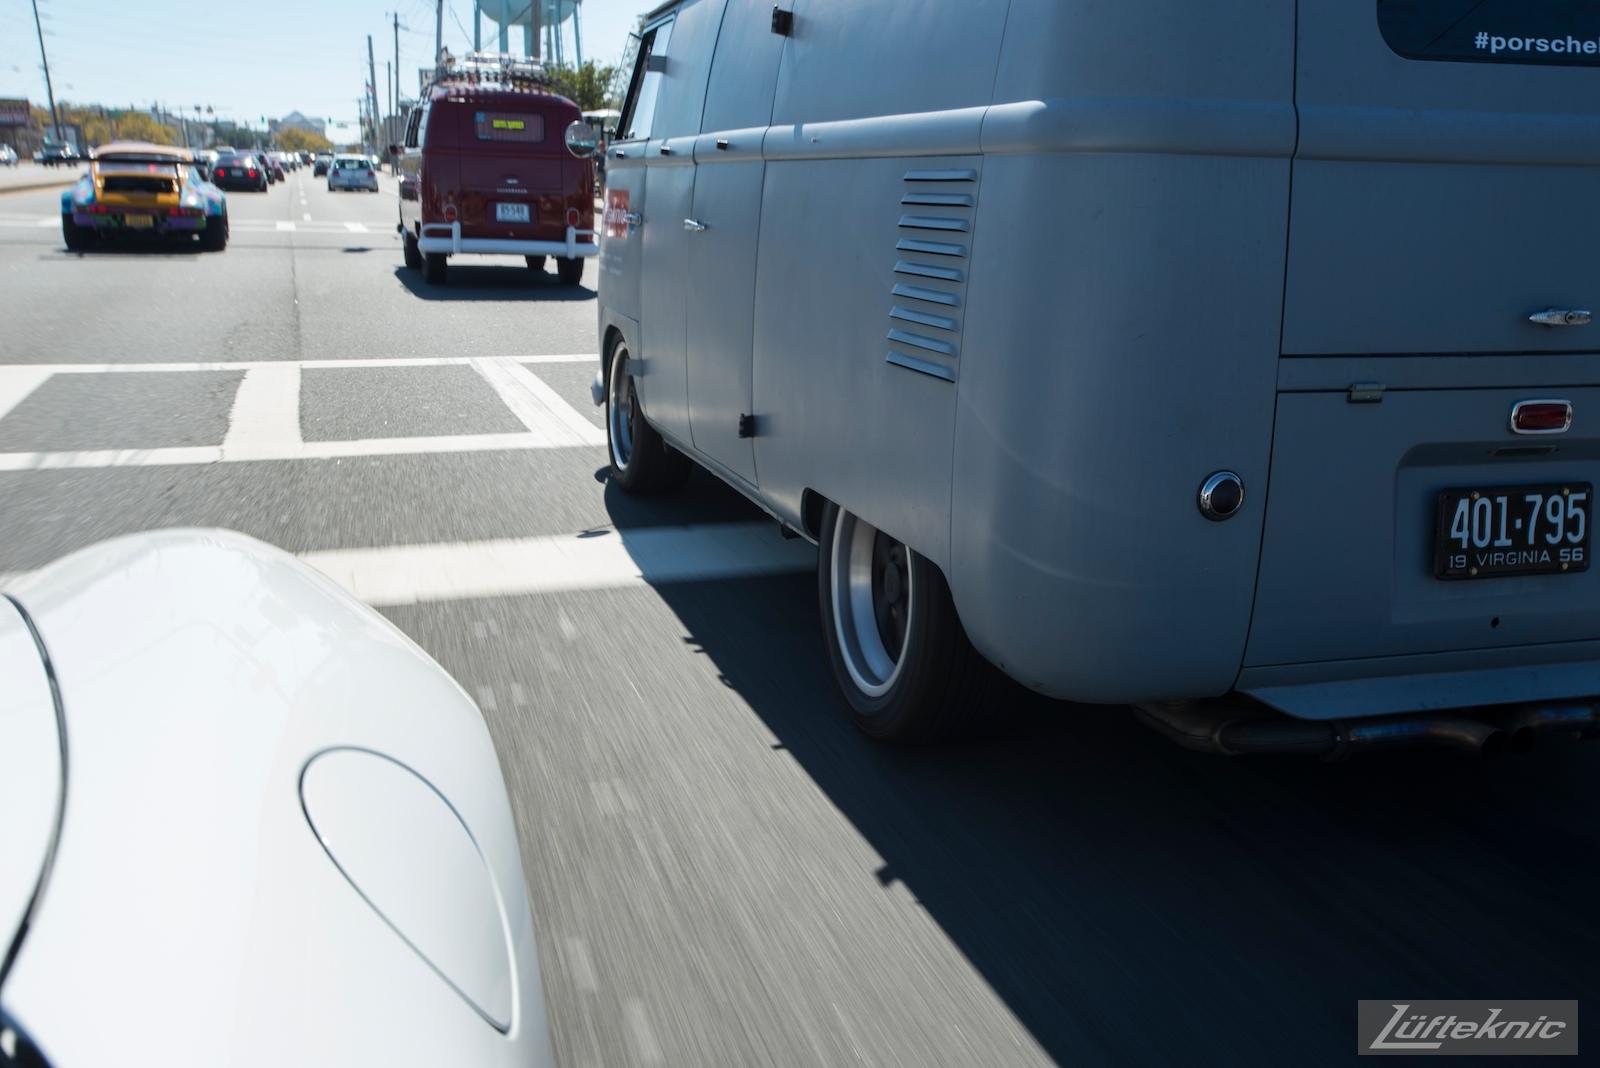 1956 Volkswagen double panel Transporter PorscheBus at h2o international.